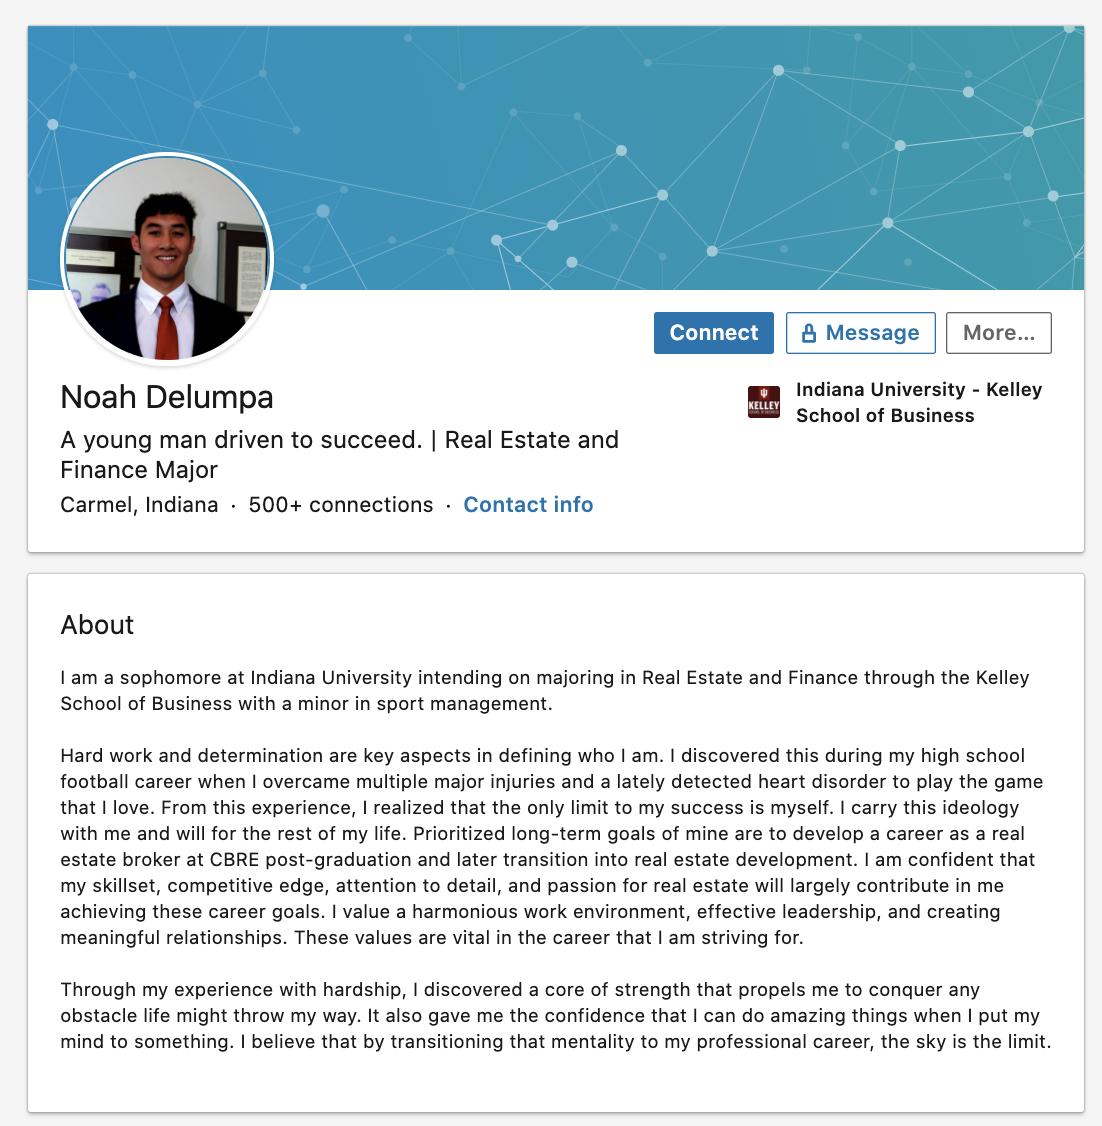 29 Stunningly Good Graduate Student LinkedIn Summary Examples